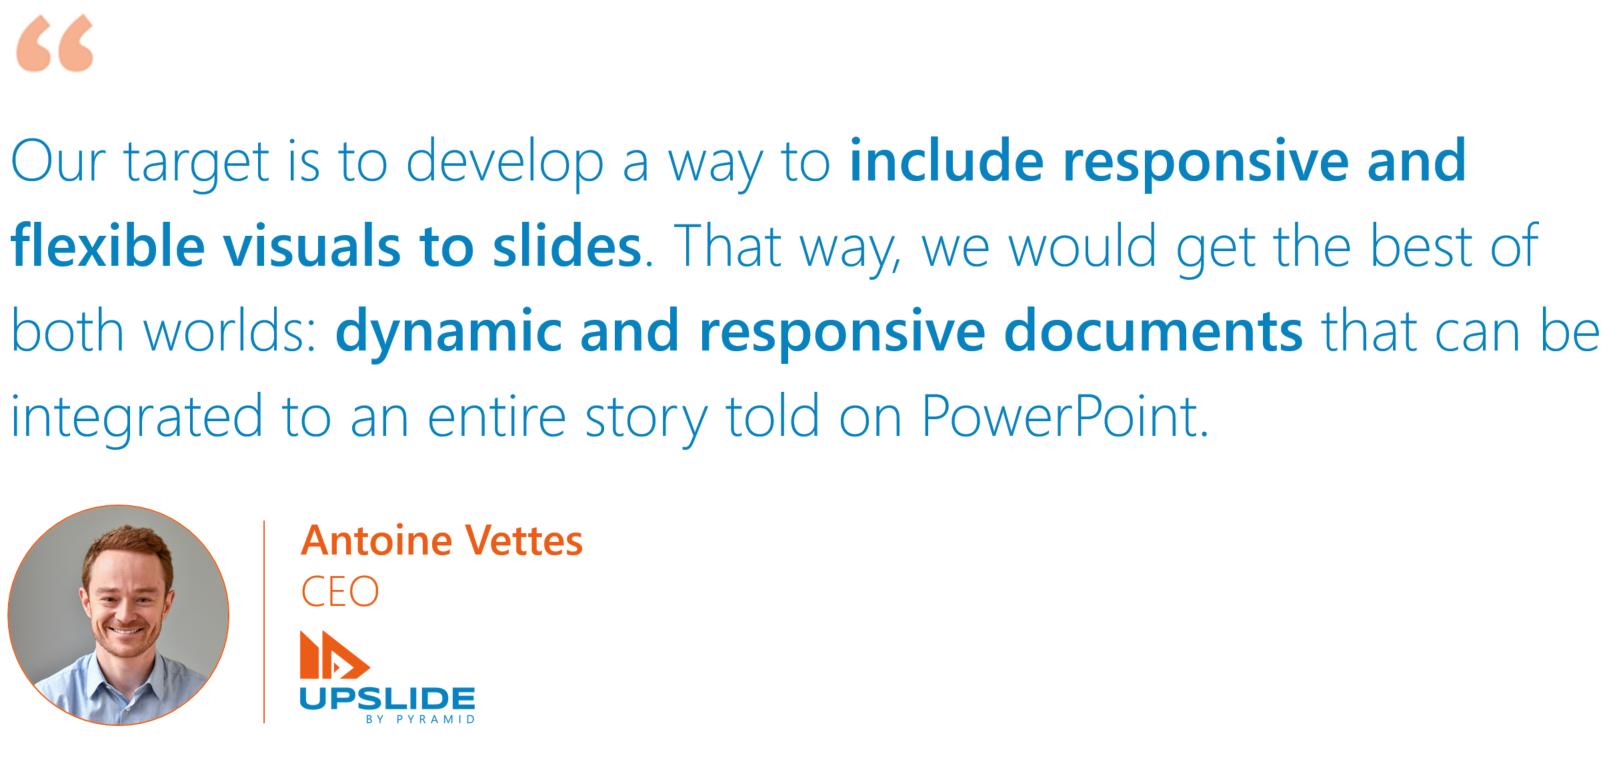 Antoine Vettes, CEO of UpSlide